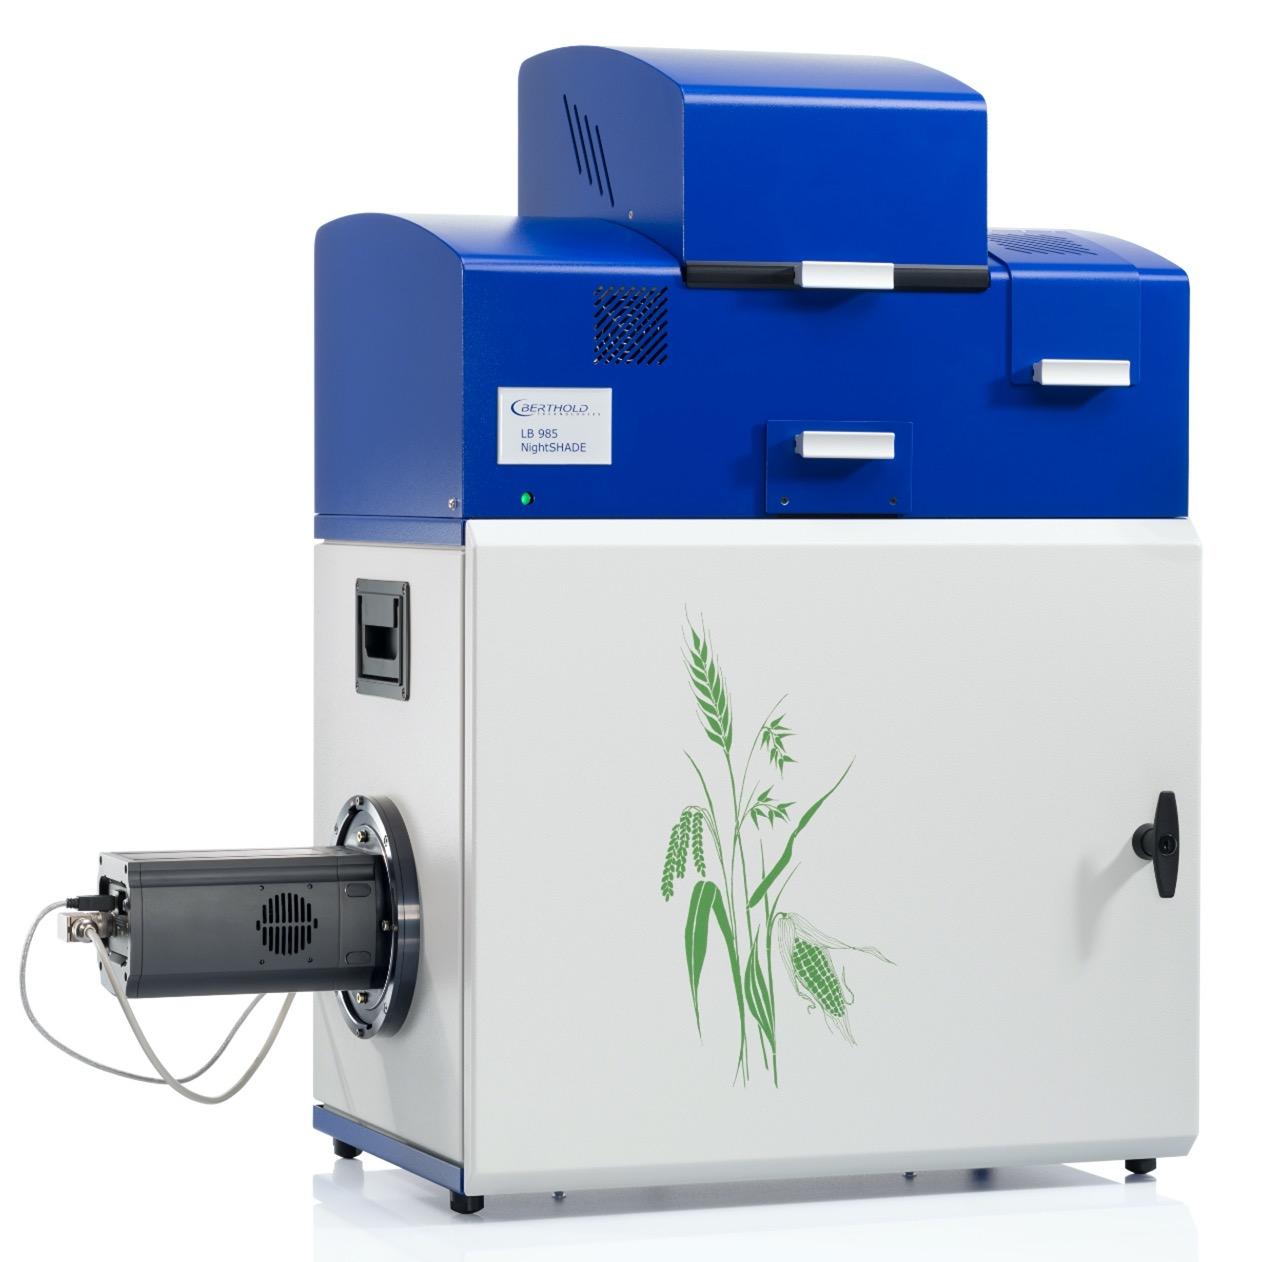 Berthold 植物活体成像系统 LB 985